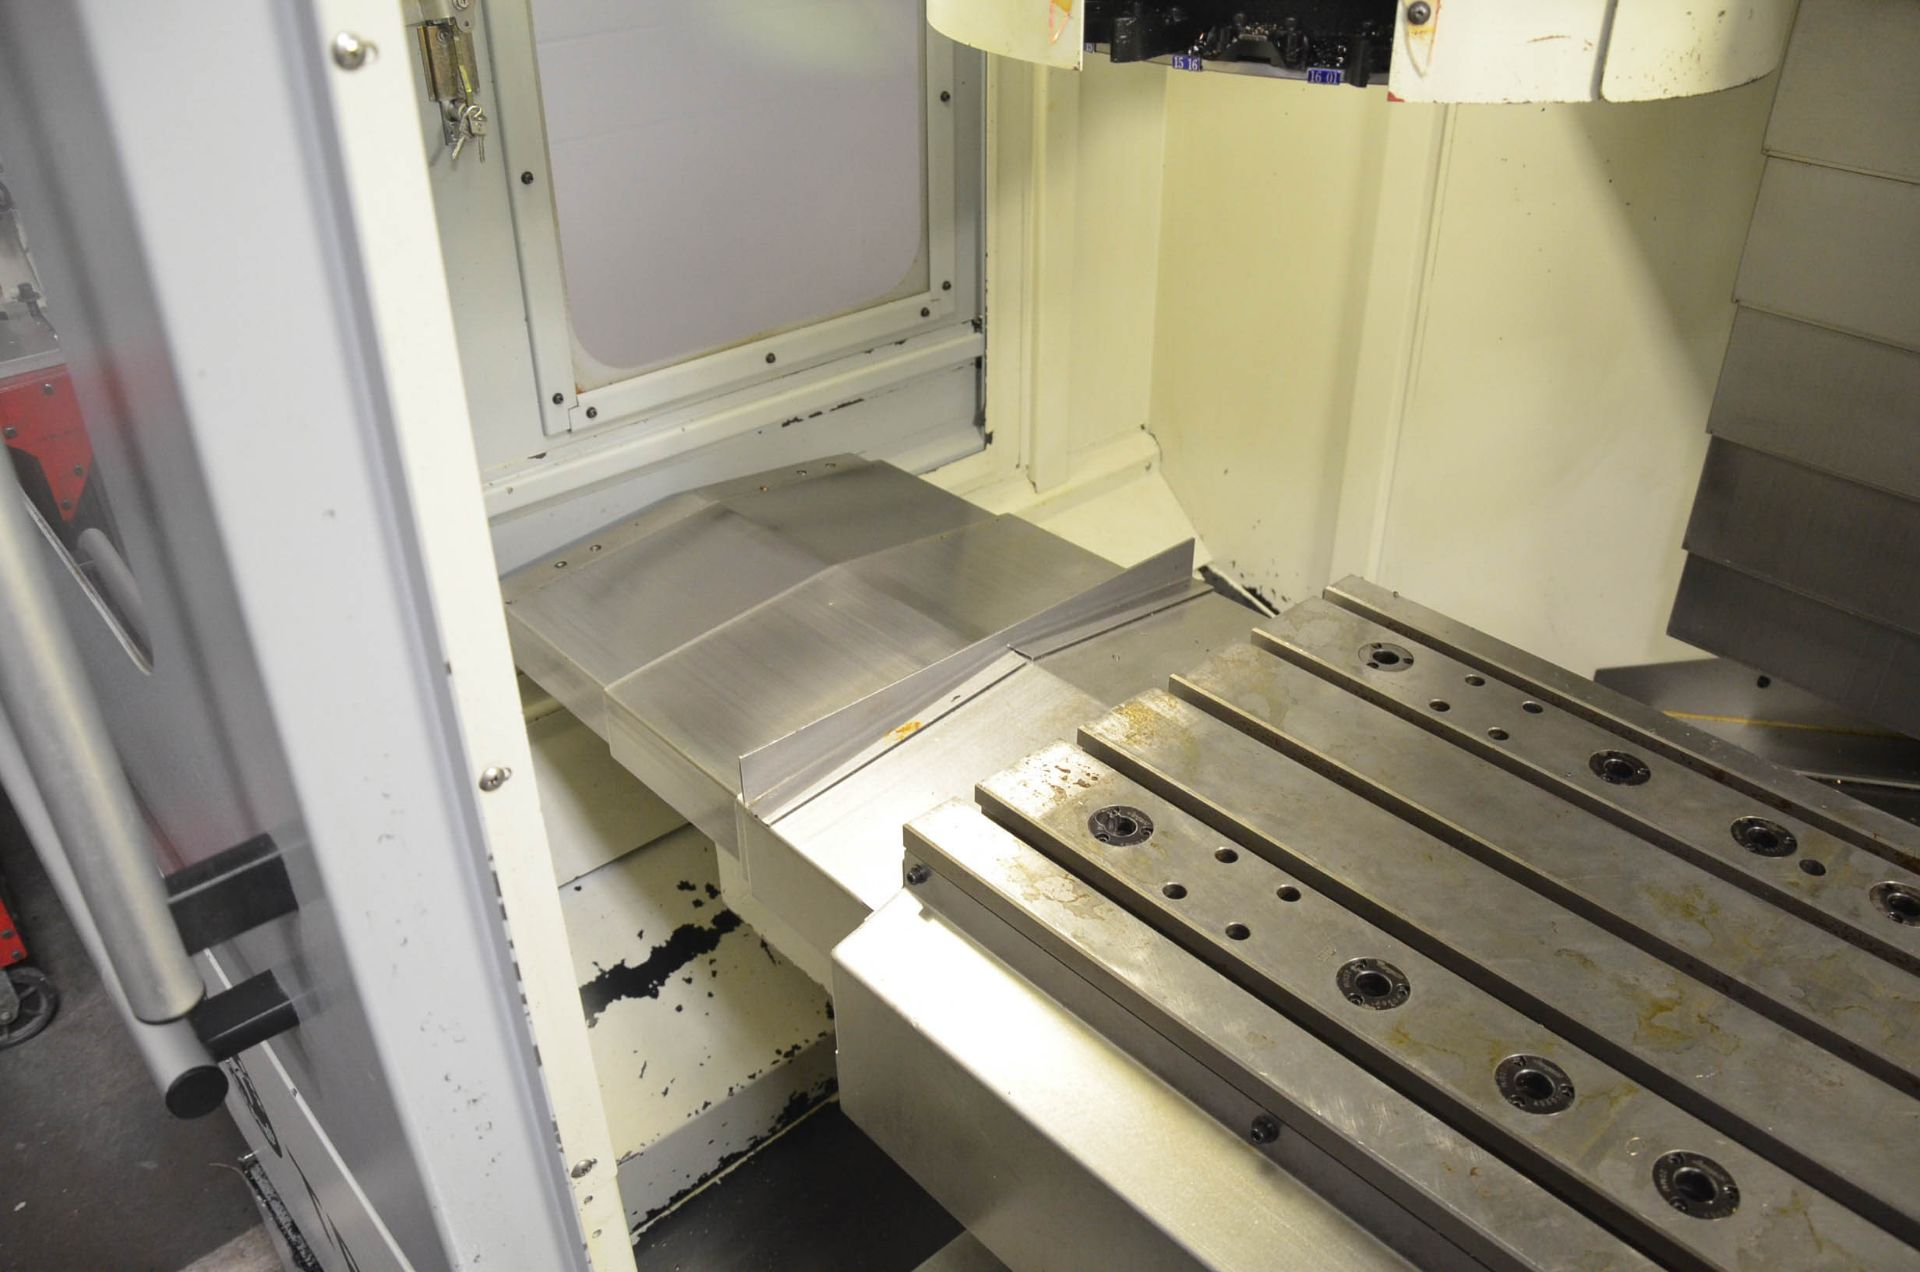 SWI (2012) TRAK LPM 4-AXIS READY CNC VERTICAL MACHINING CENTER WITH PROTO TRAK PMX CNC CONTROL, 19. - Image 9 of 10